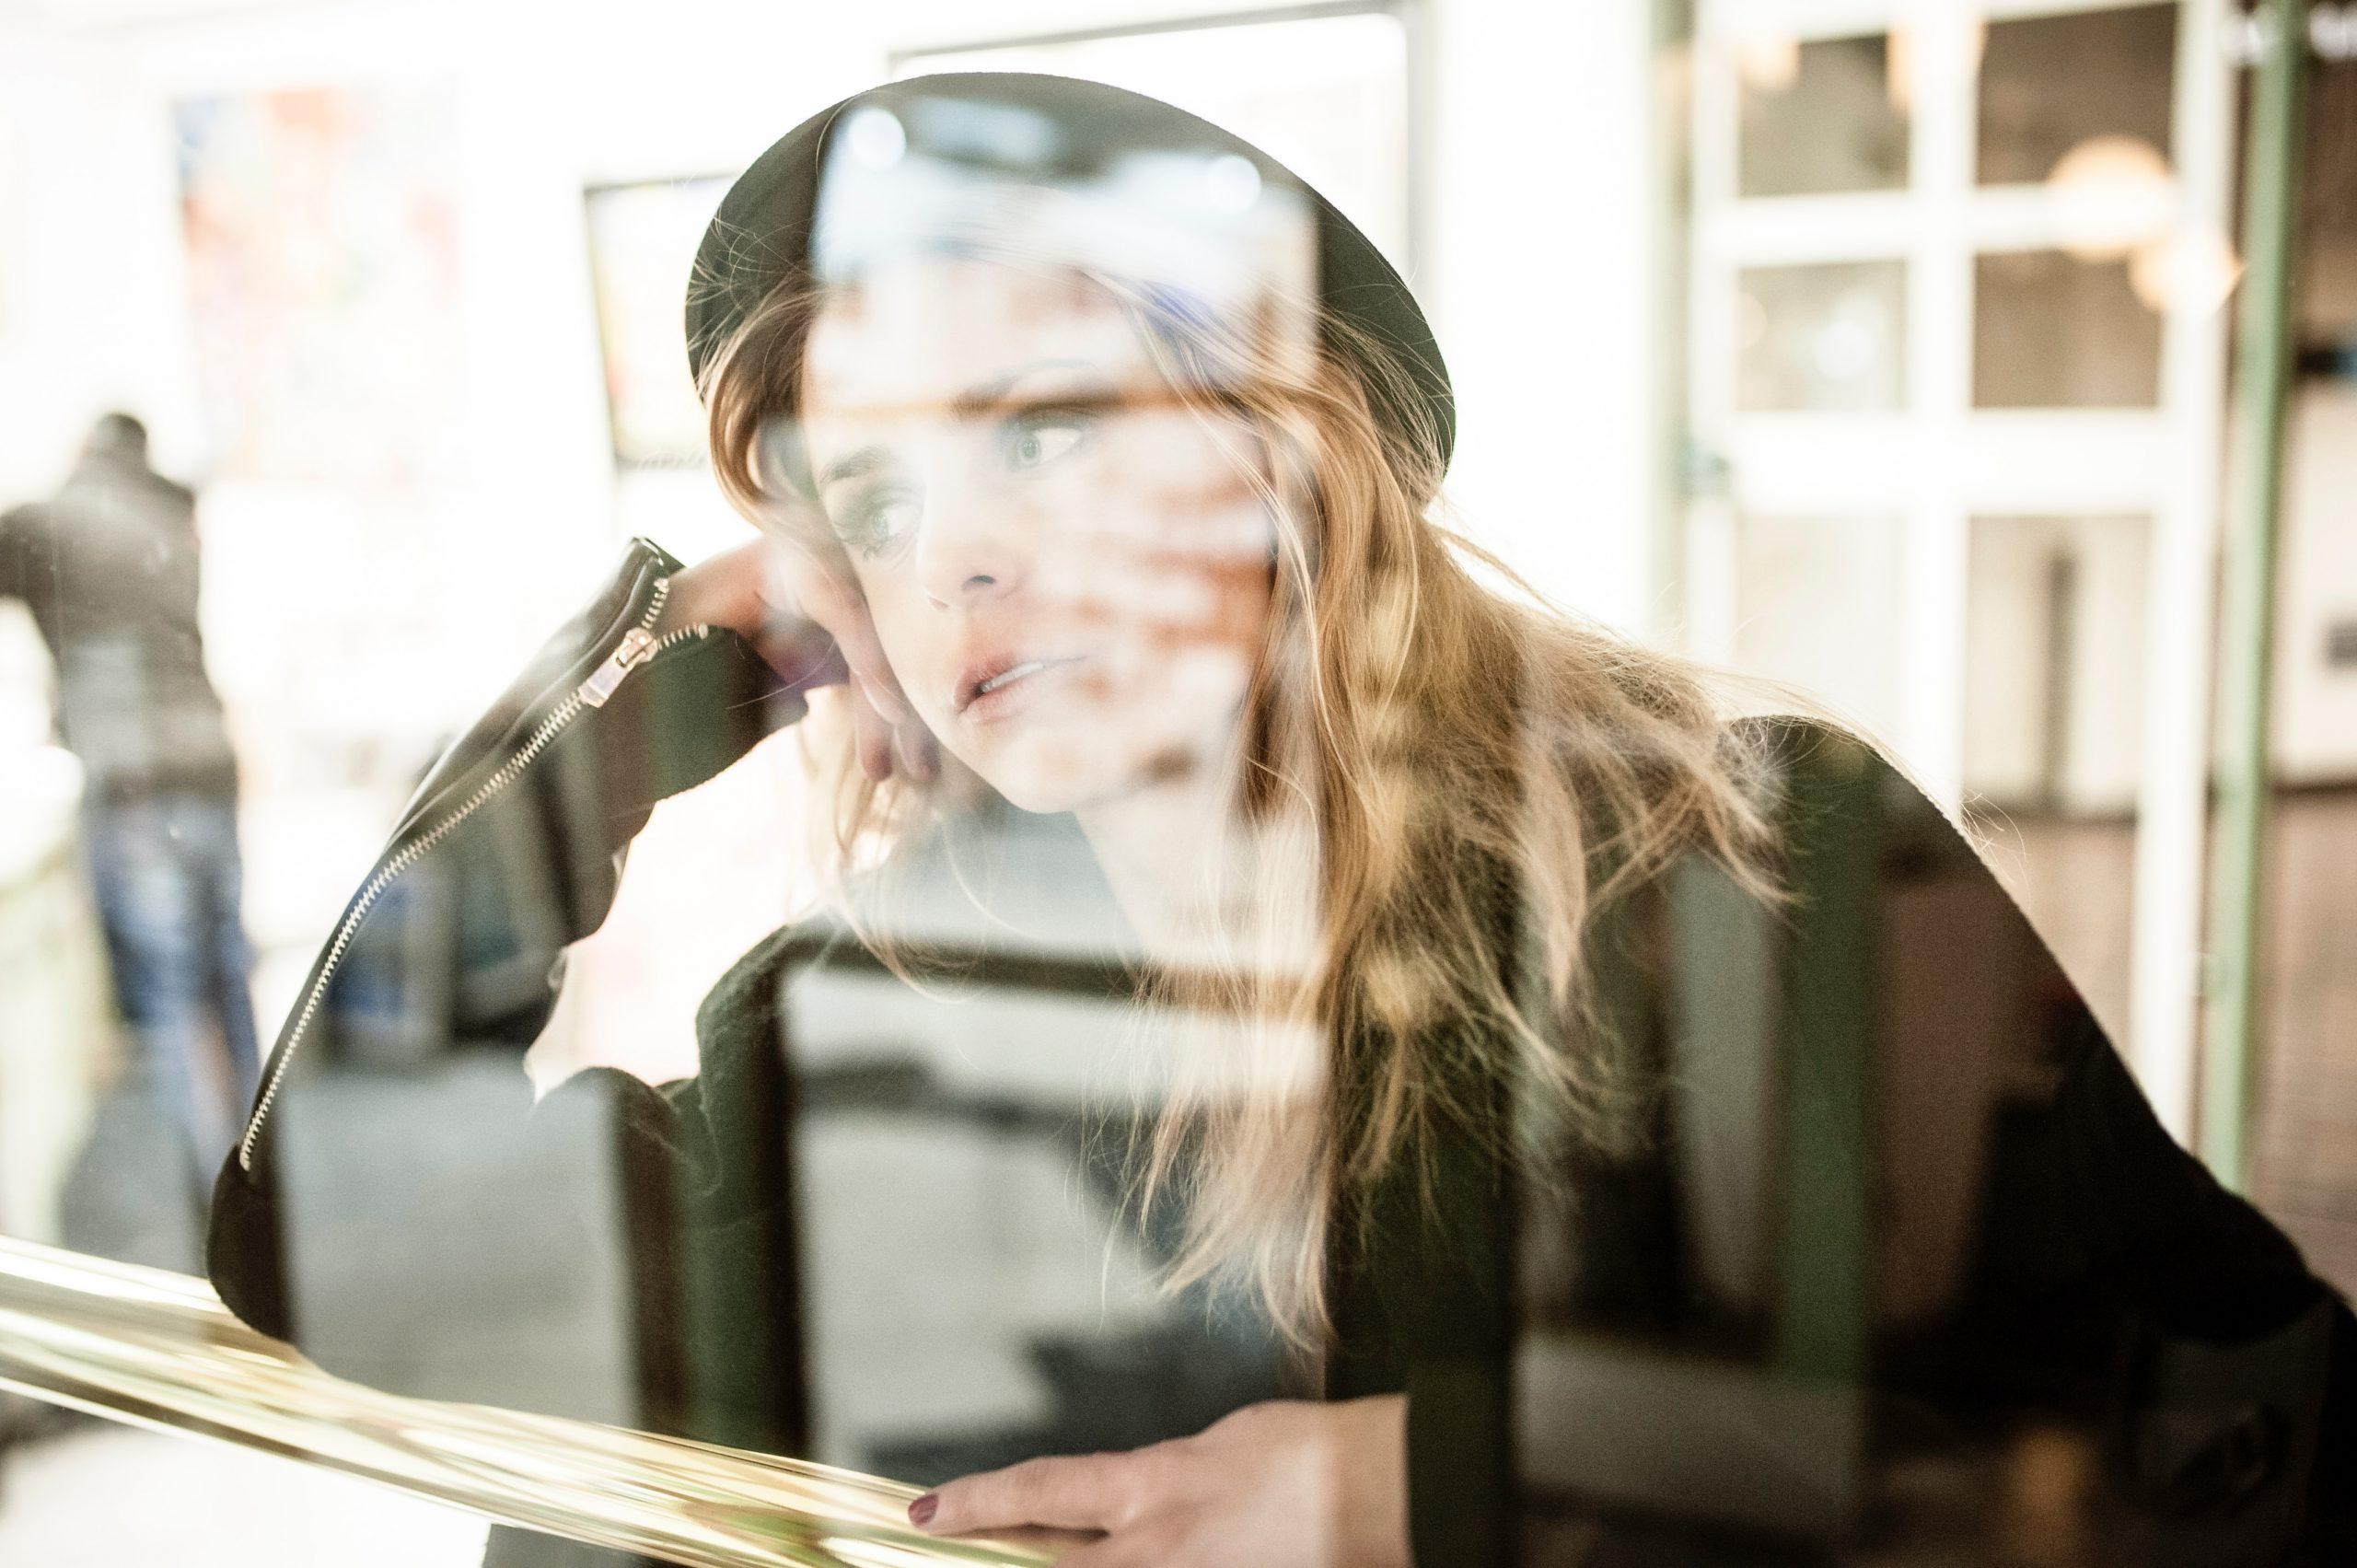 A barátnőm pasija félrelép: Lebuktassam vagy ne?